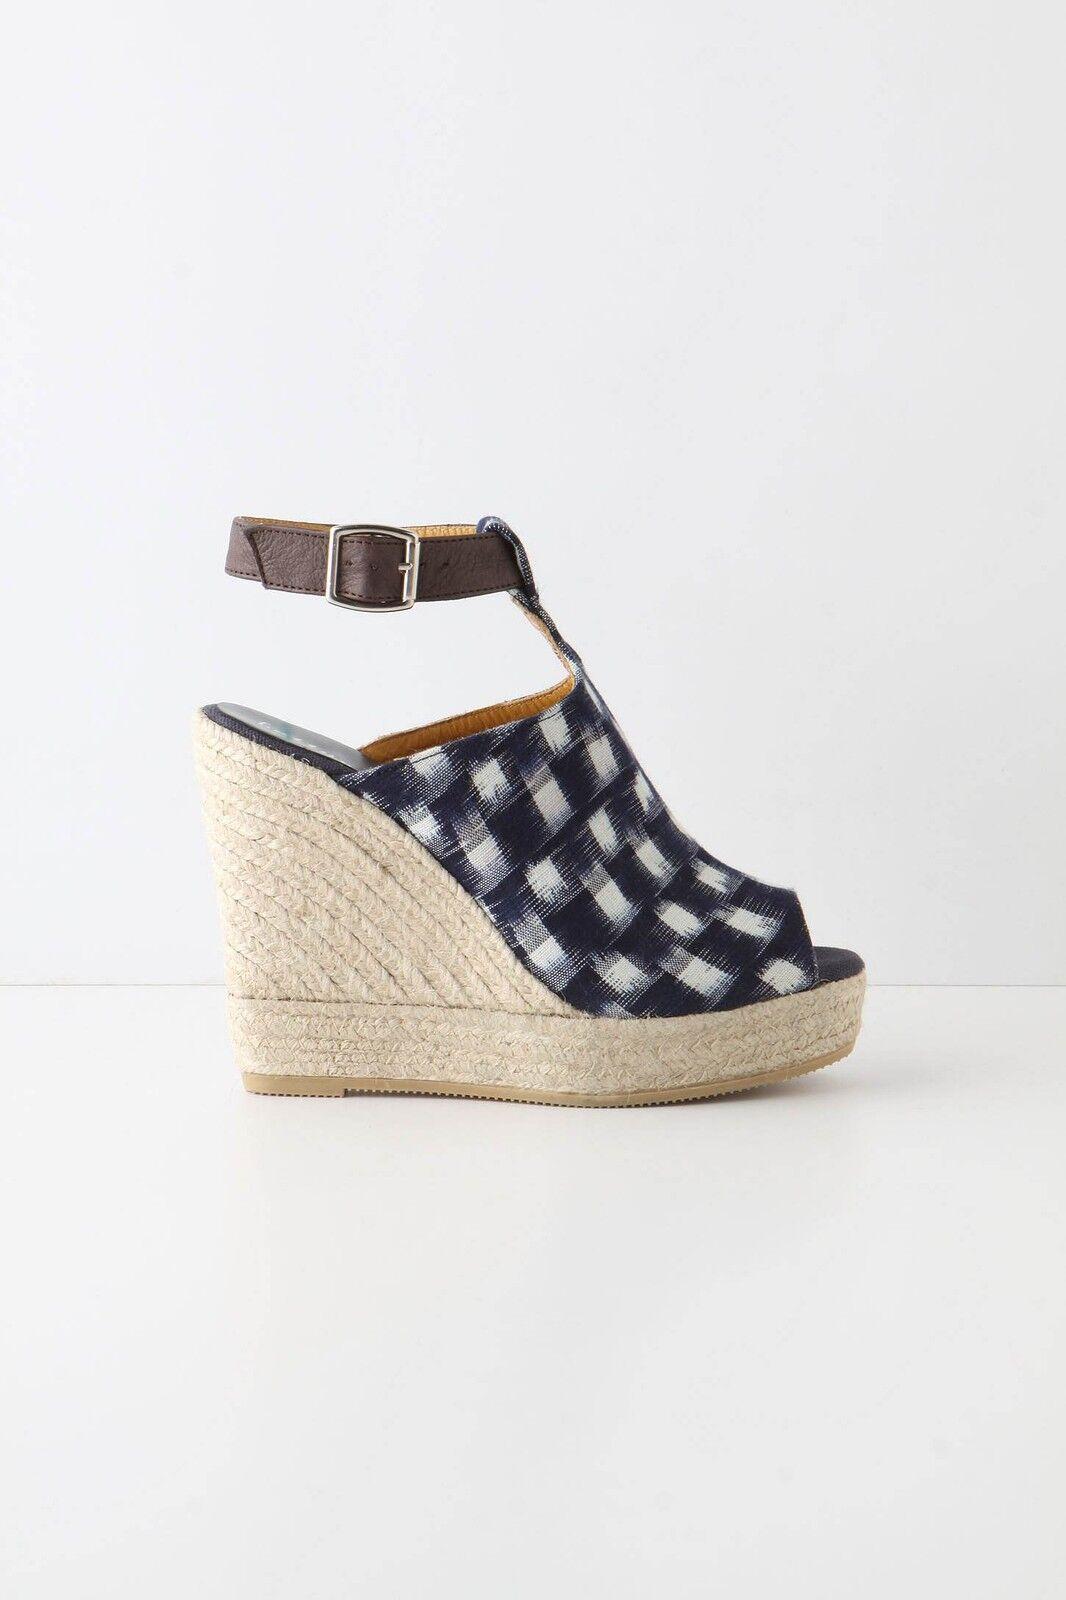 Anthropologie schuhe schuhe schuhe Sandals Flux Wedges Open Toe Gingham Bettye Muller, 41 2ee838